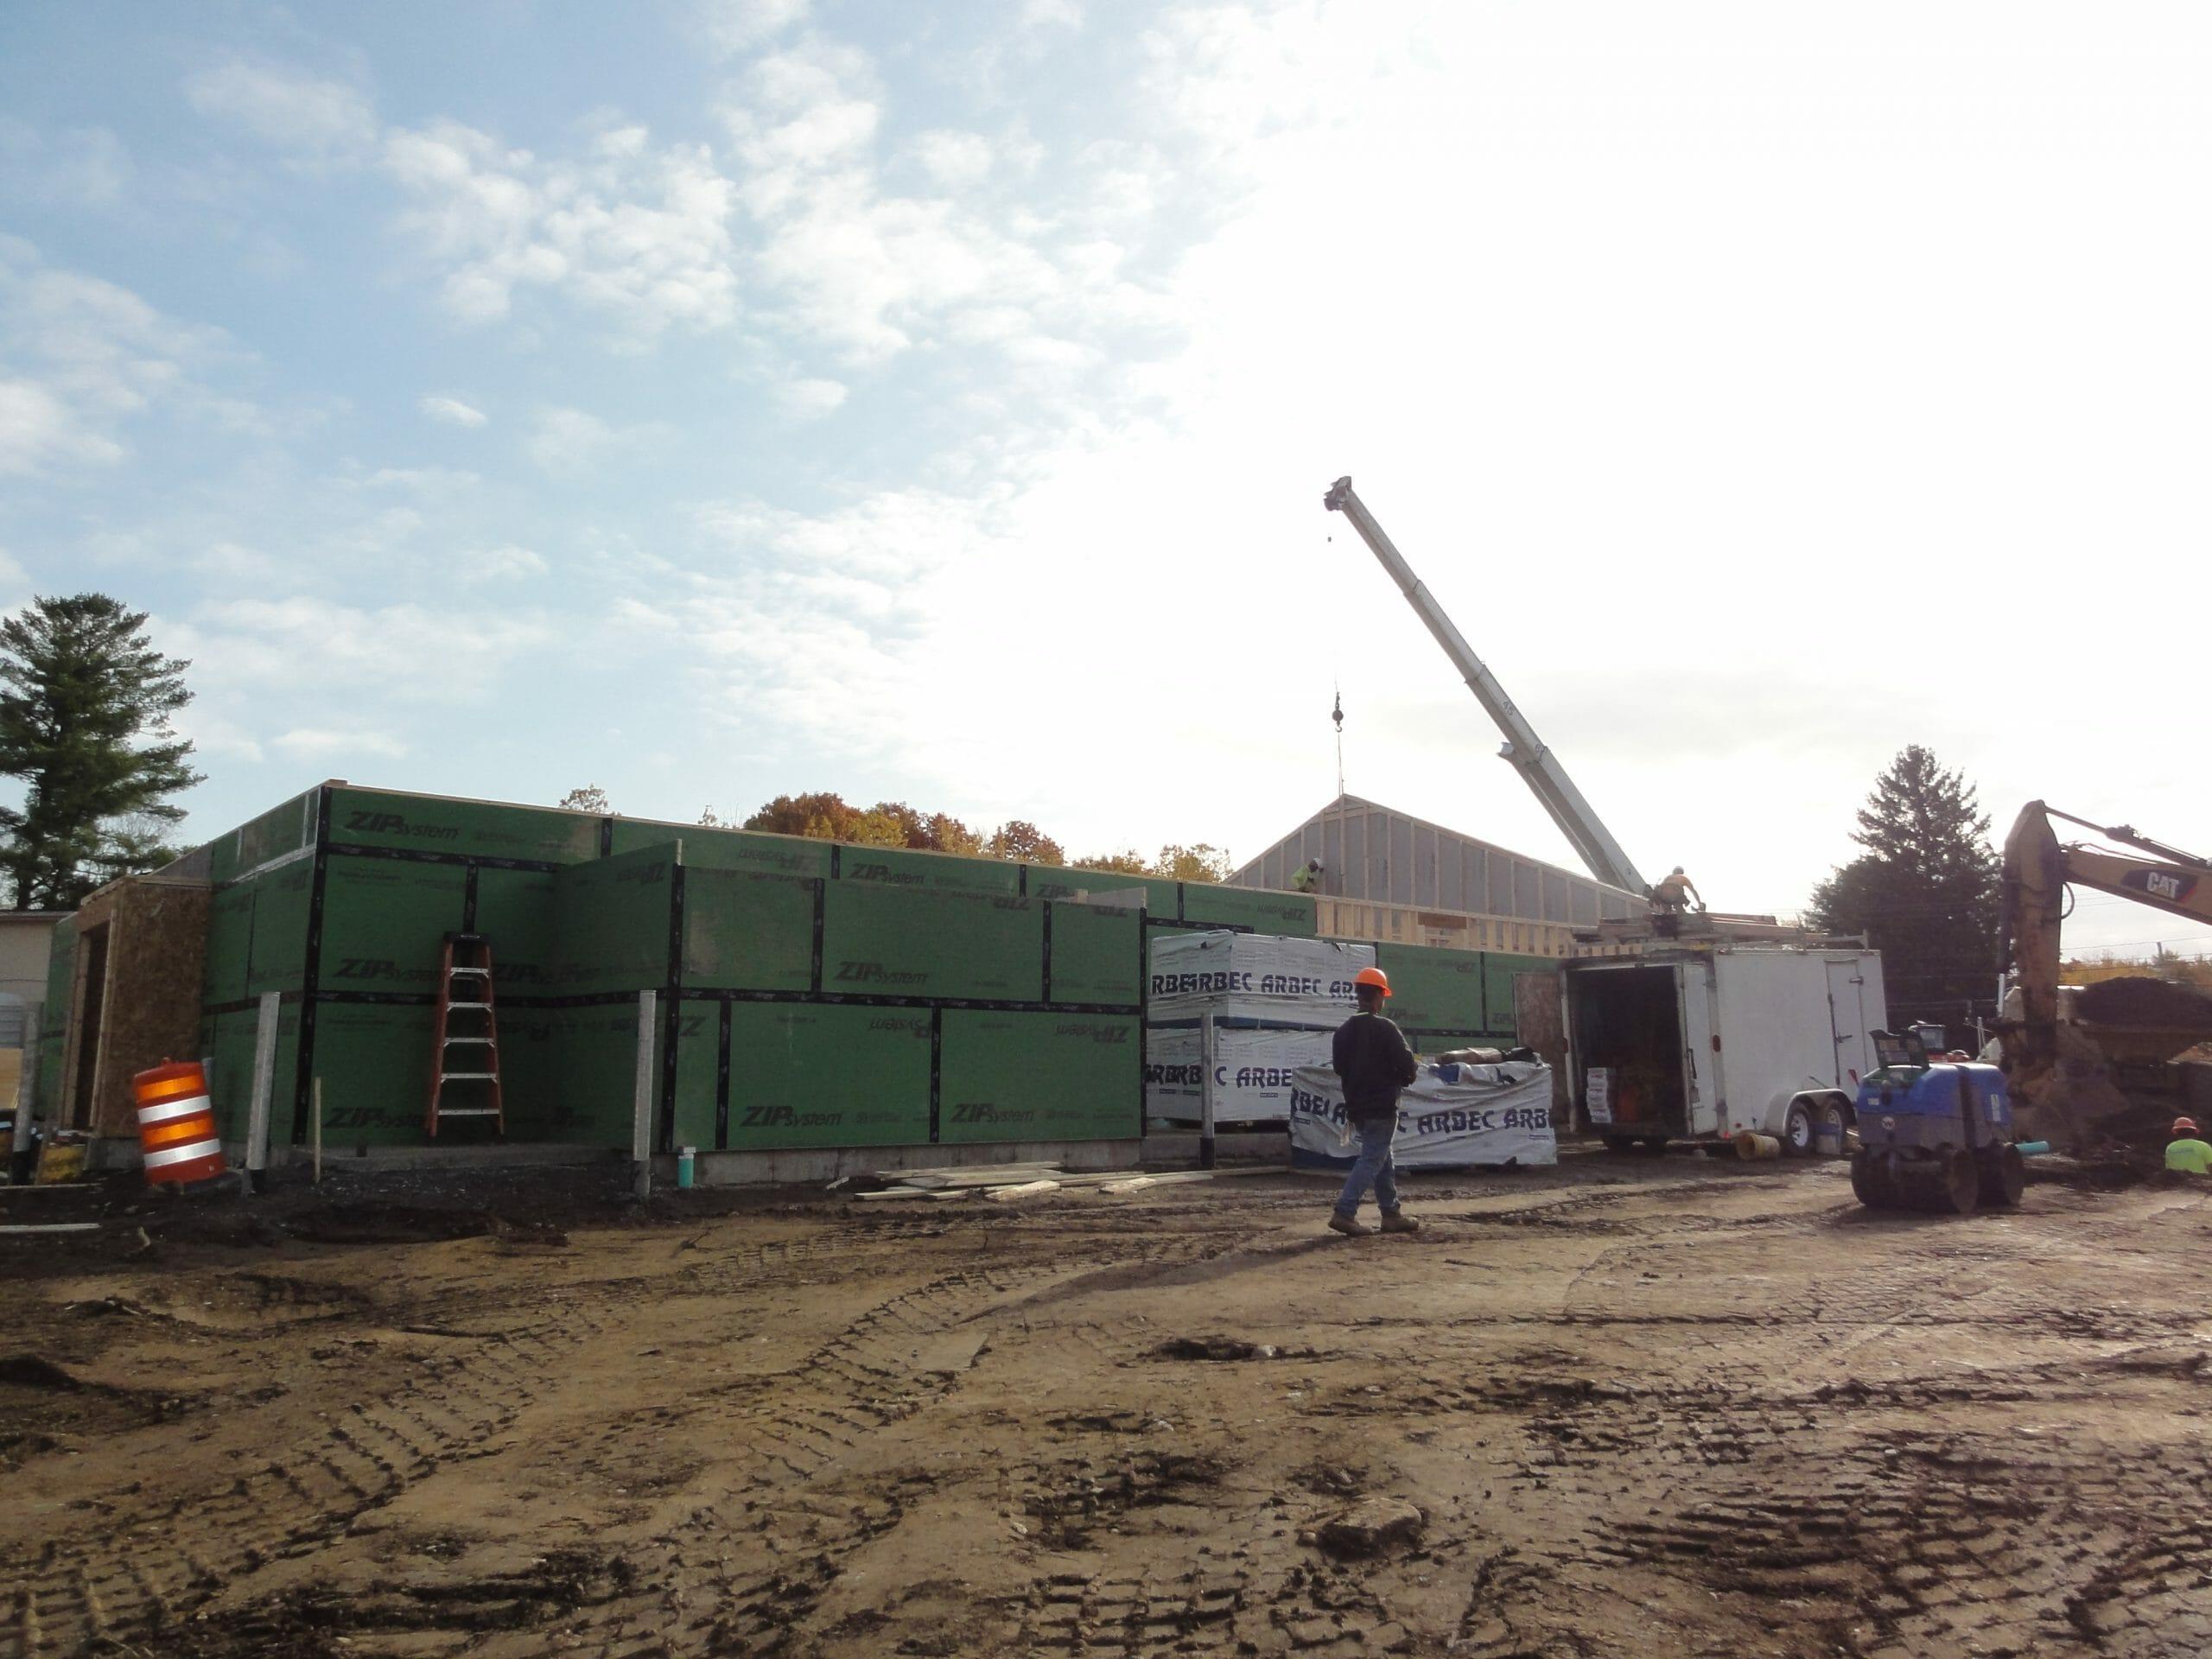 Sacangada Rd Stewarts being built